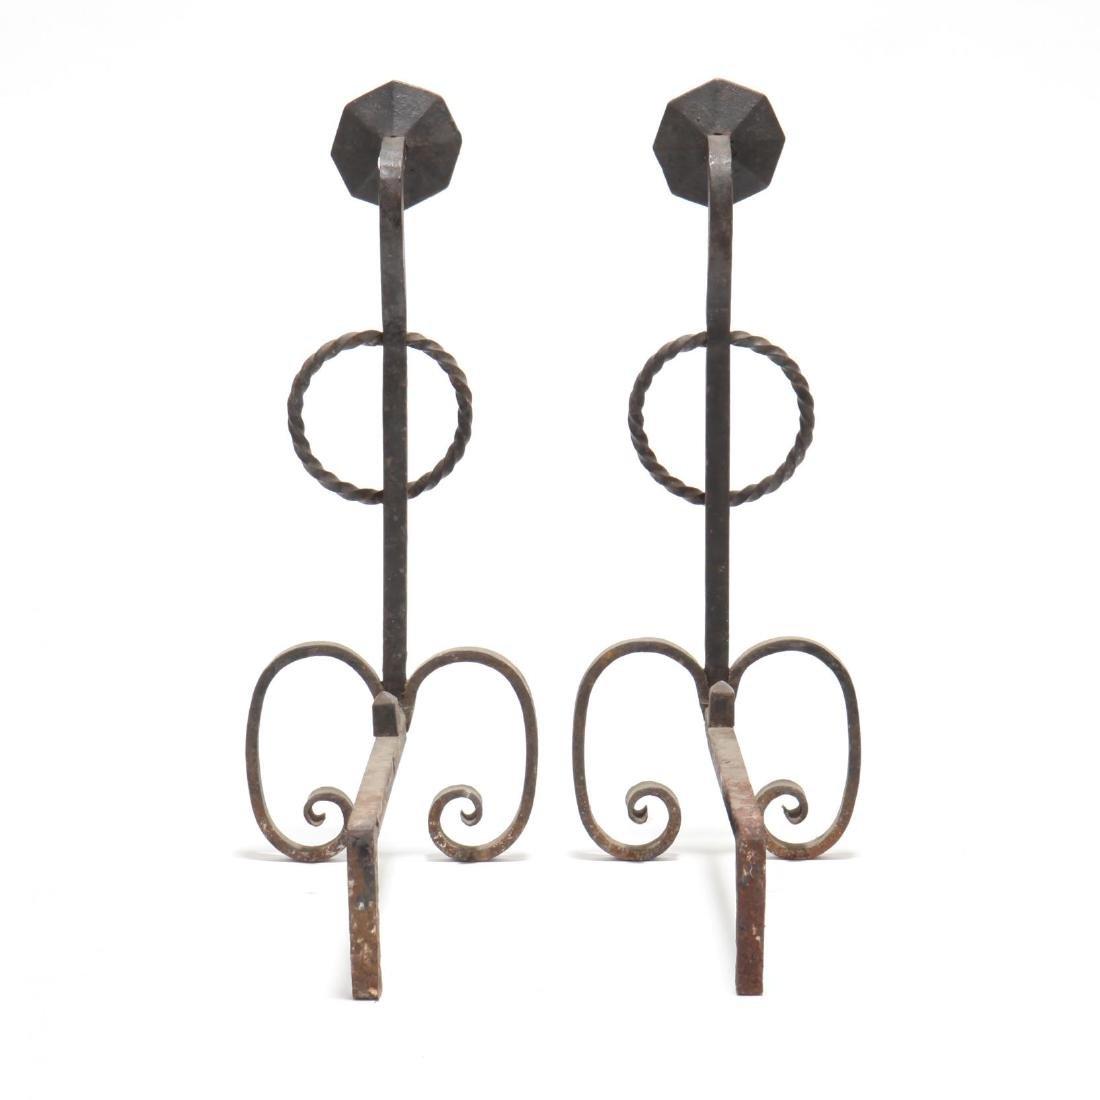 Pair of Wrought Iron Andirons - 2